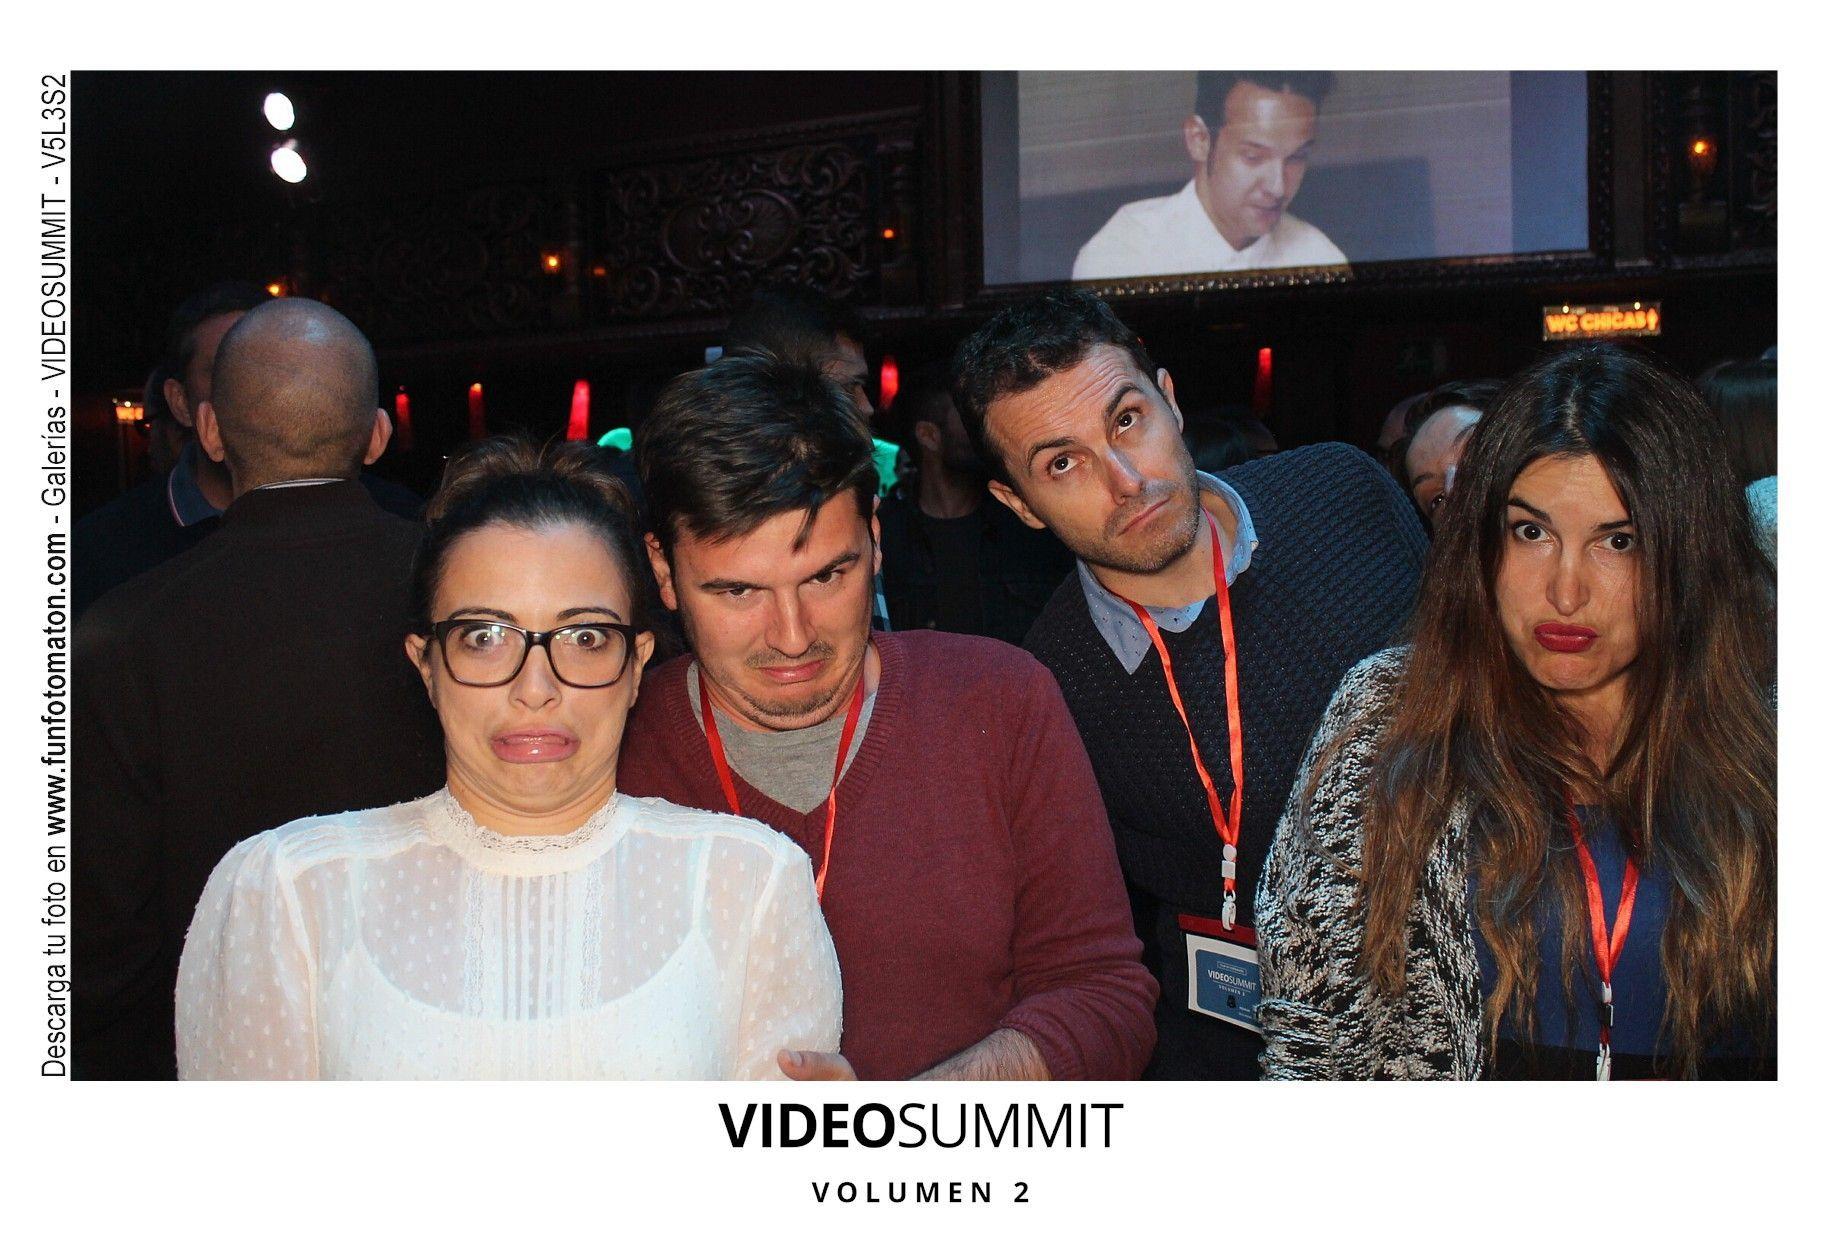 videosummit-vol2-club-party-041